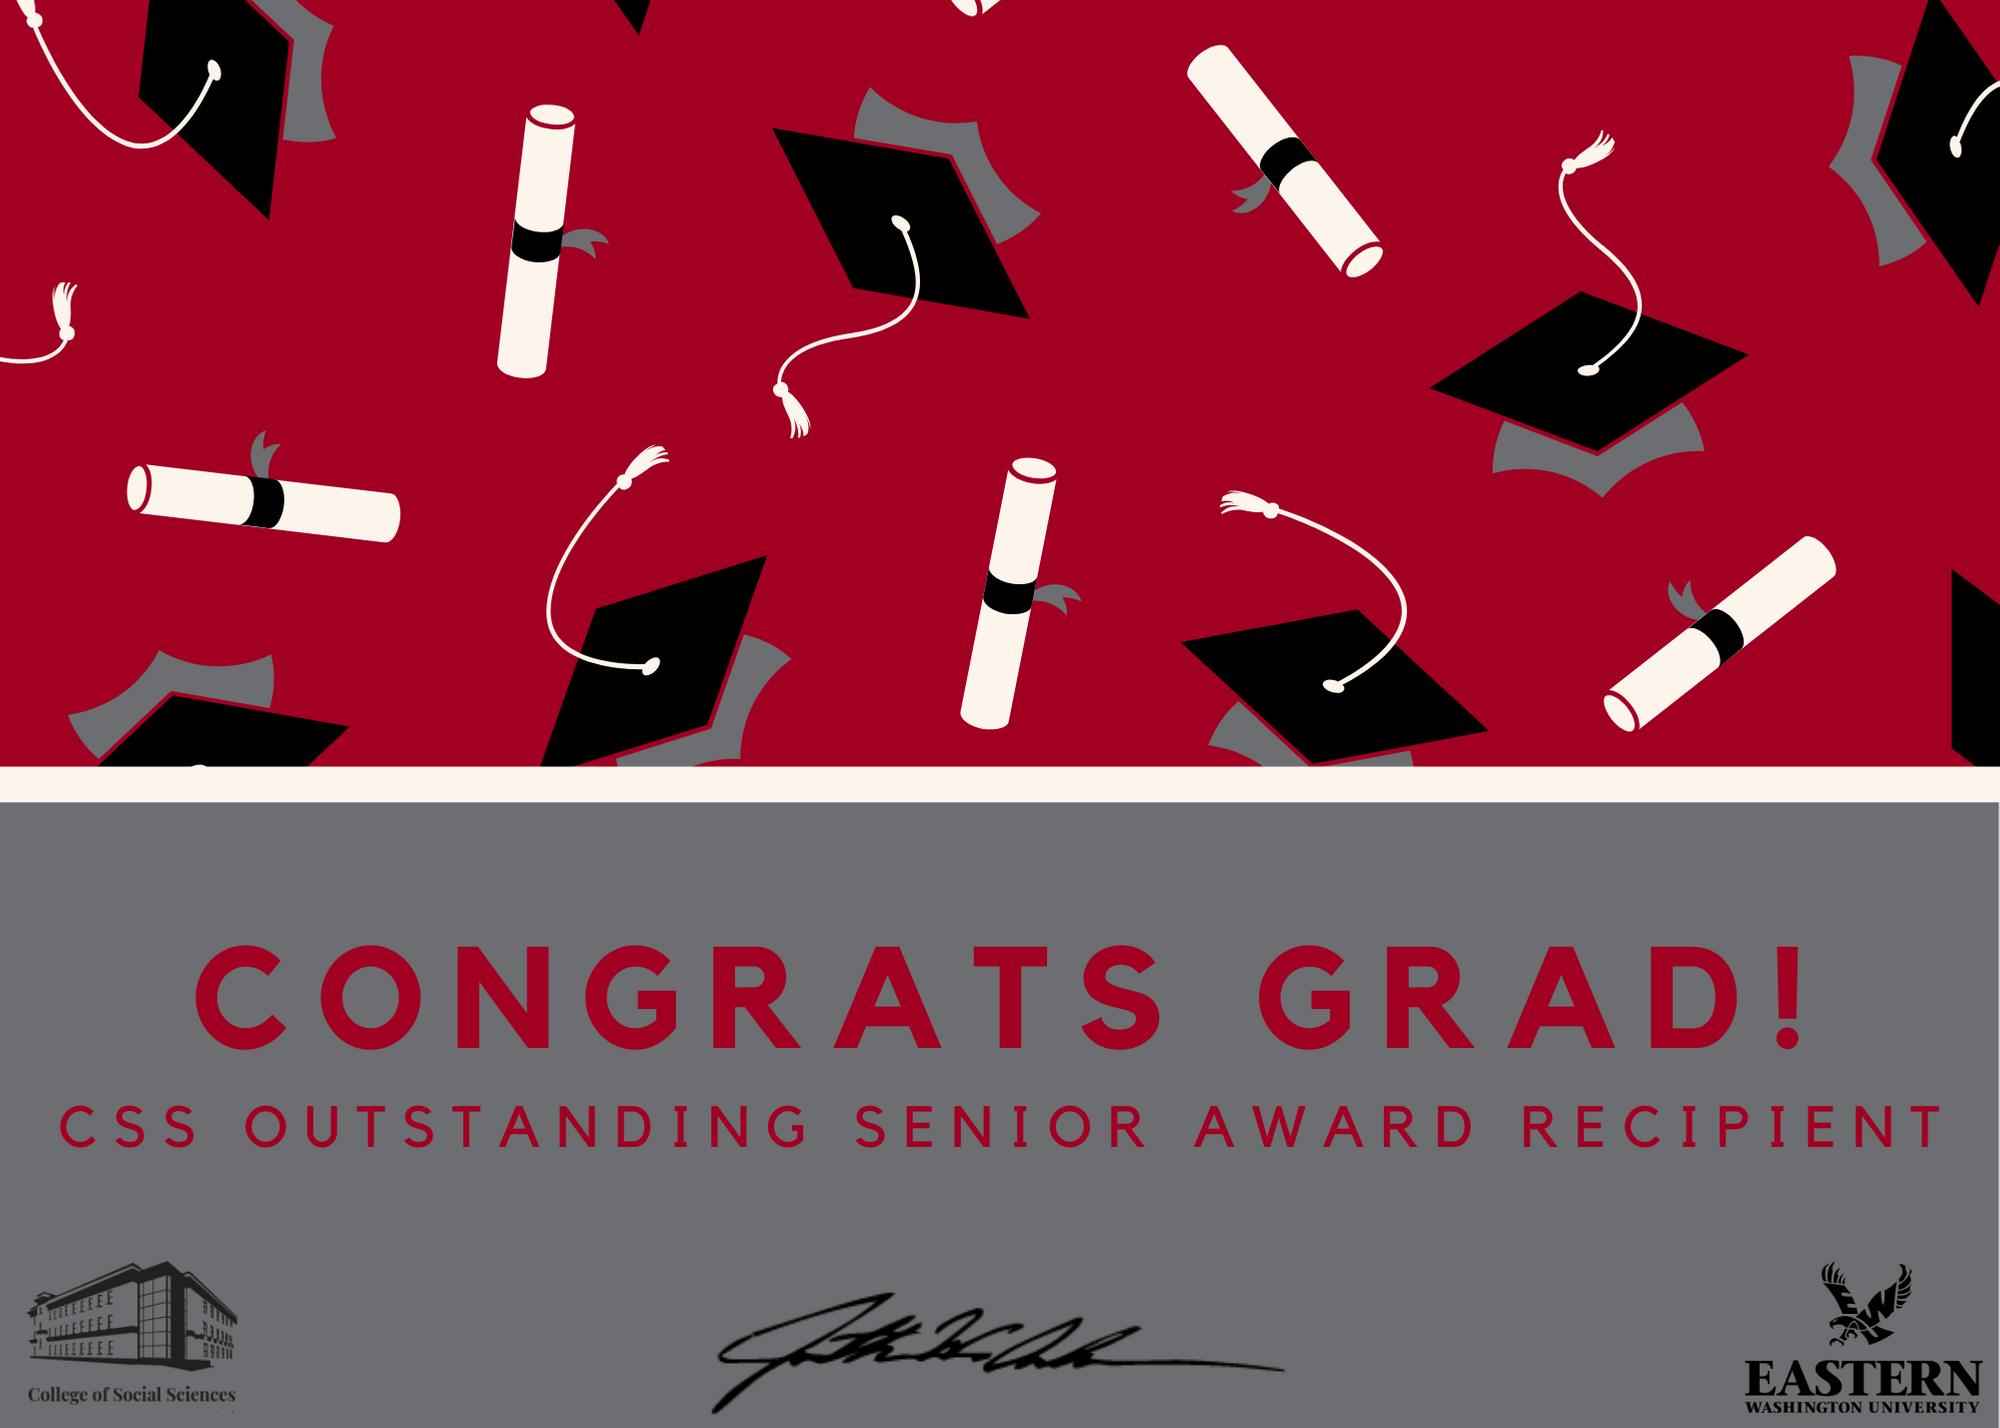 2314-caps-and-diplomas-pattern-graduation-card-2.png